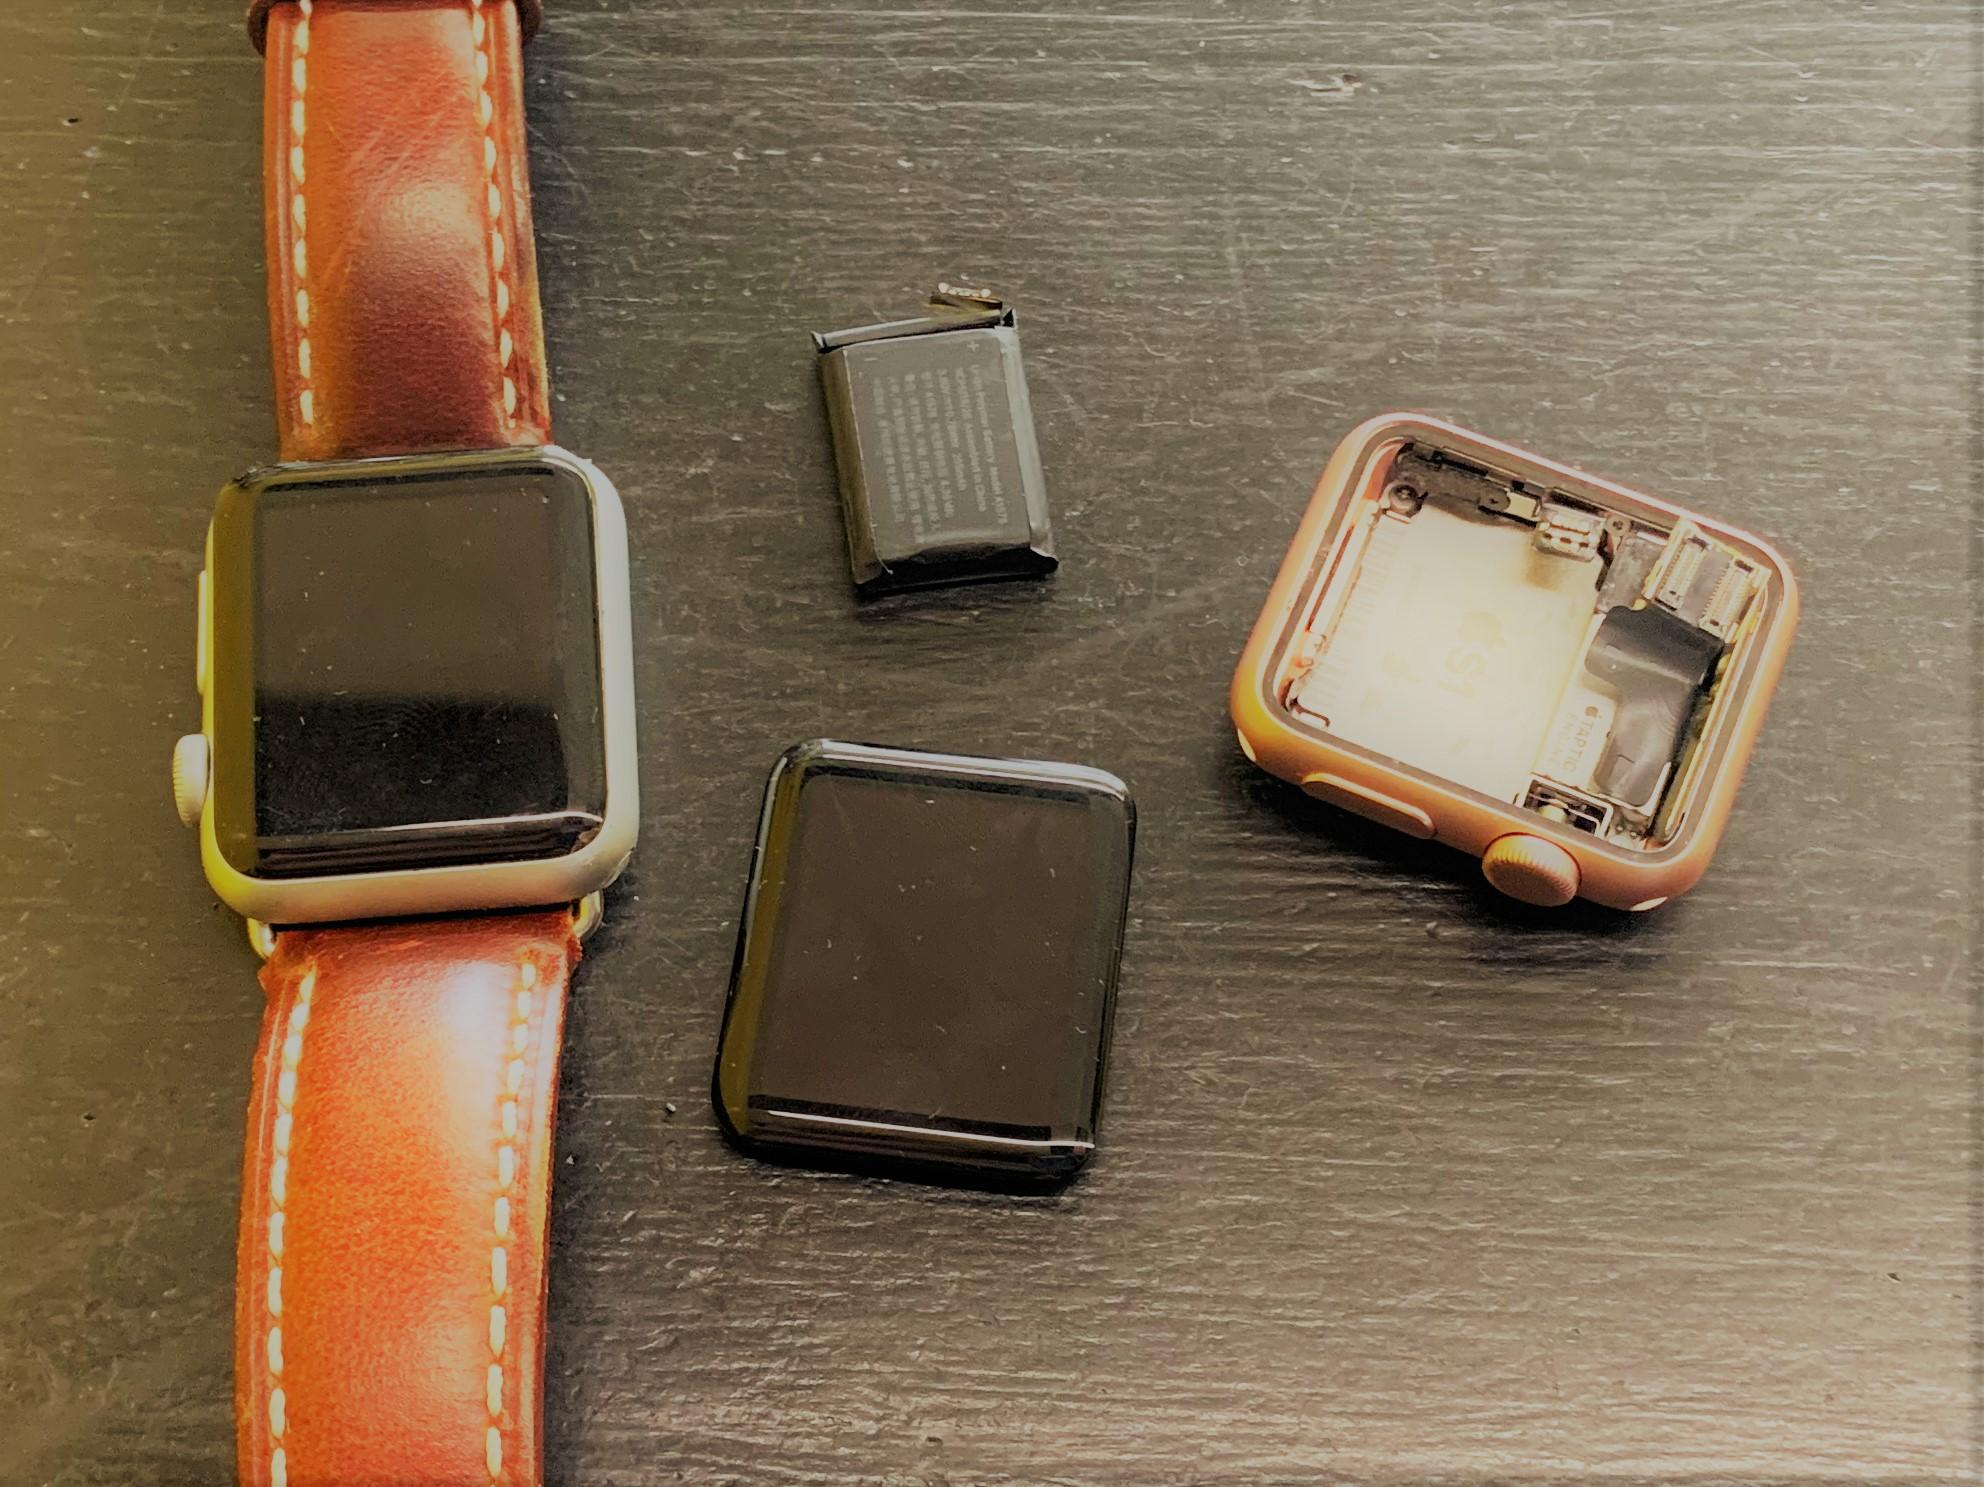 cracked apple watch screen wont work